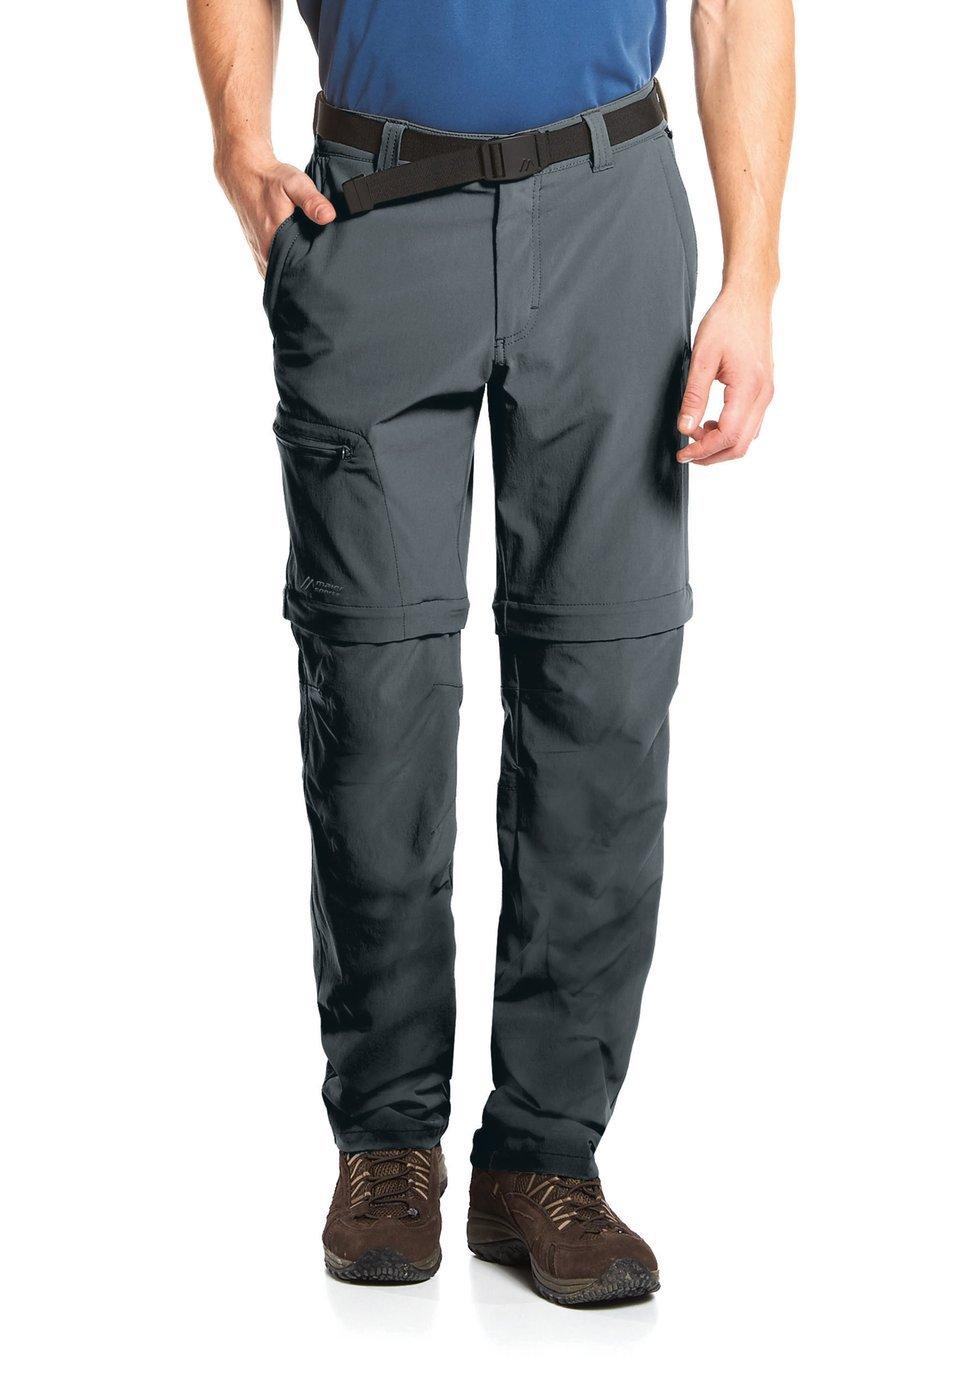 Vert Treetop Taille 33 Maier Sports - Tajo 2 - Zipp Pantalon de randonnée - Homme